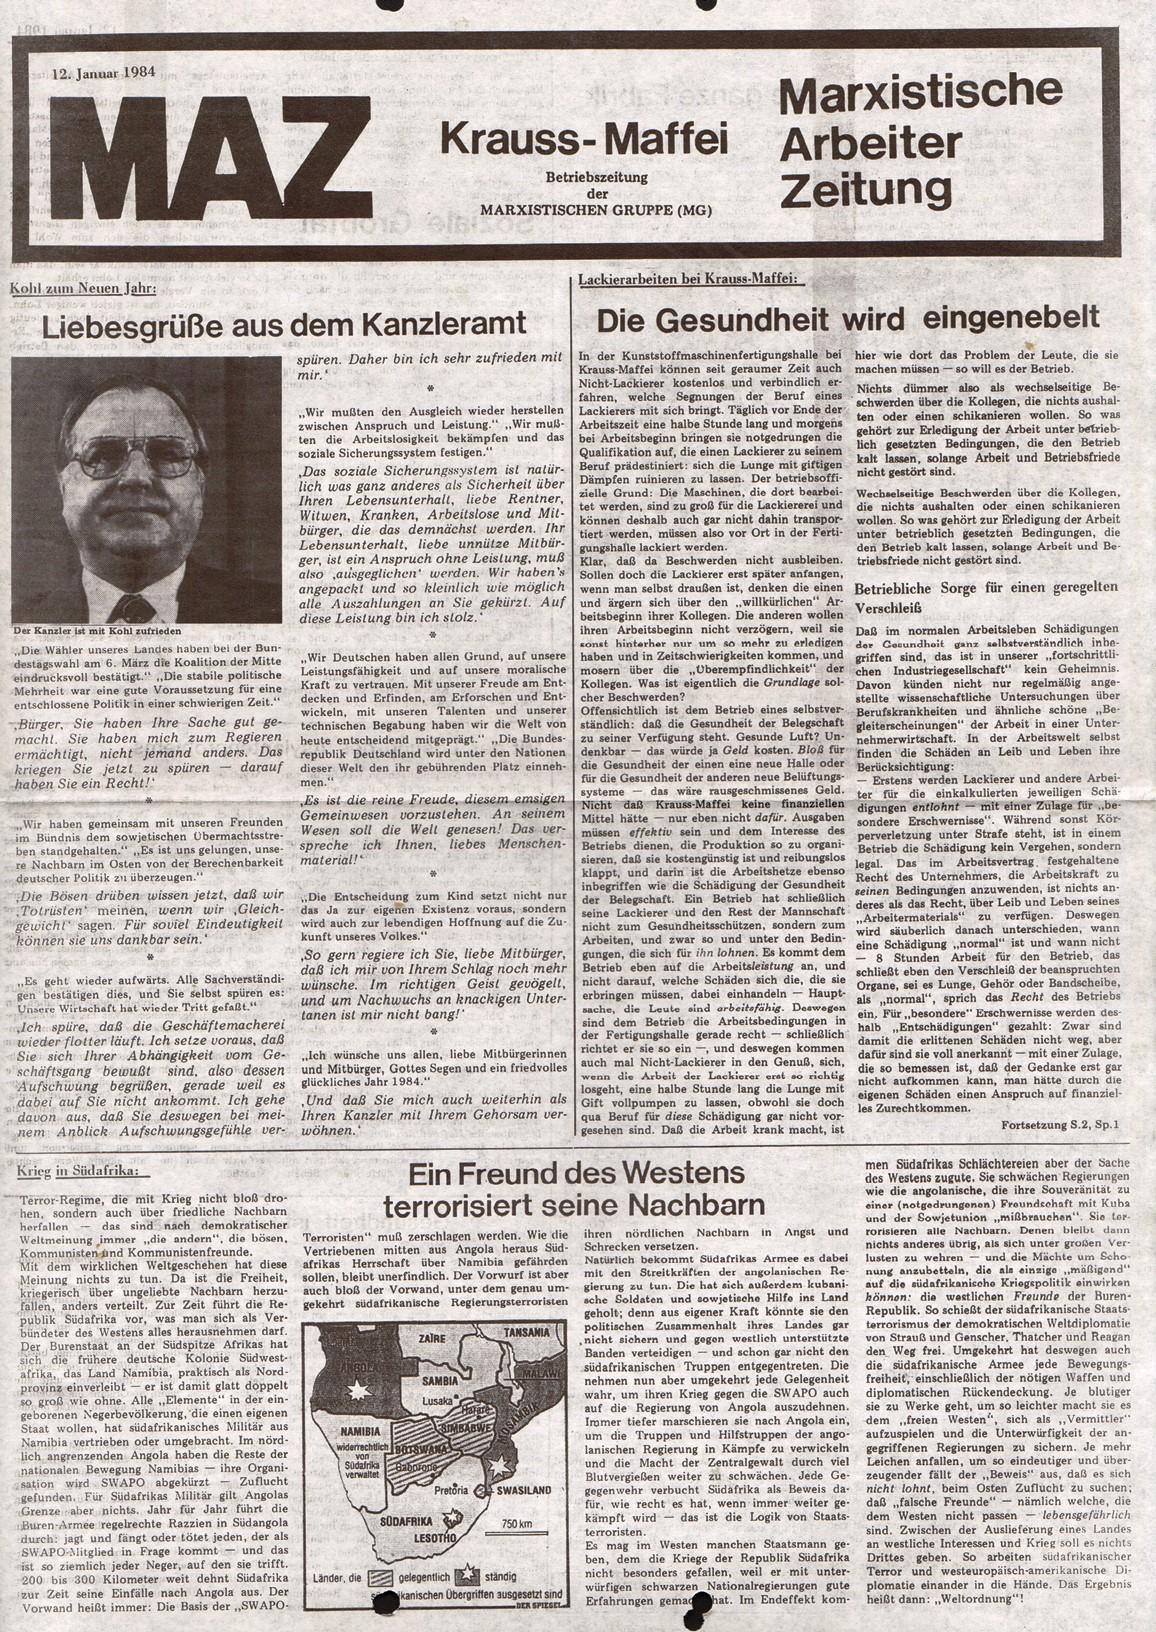 Muenchen_MG_MAZ_Krauss_Maffei_19840112_01